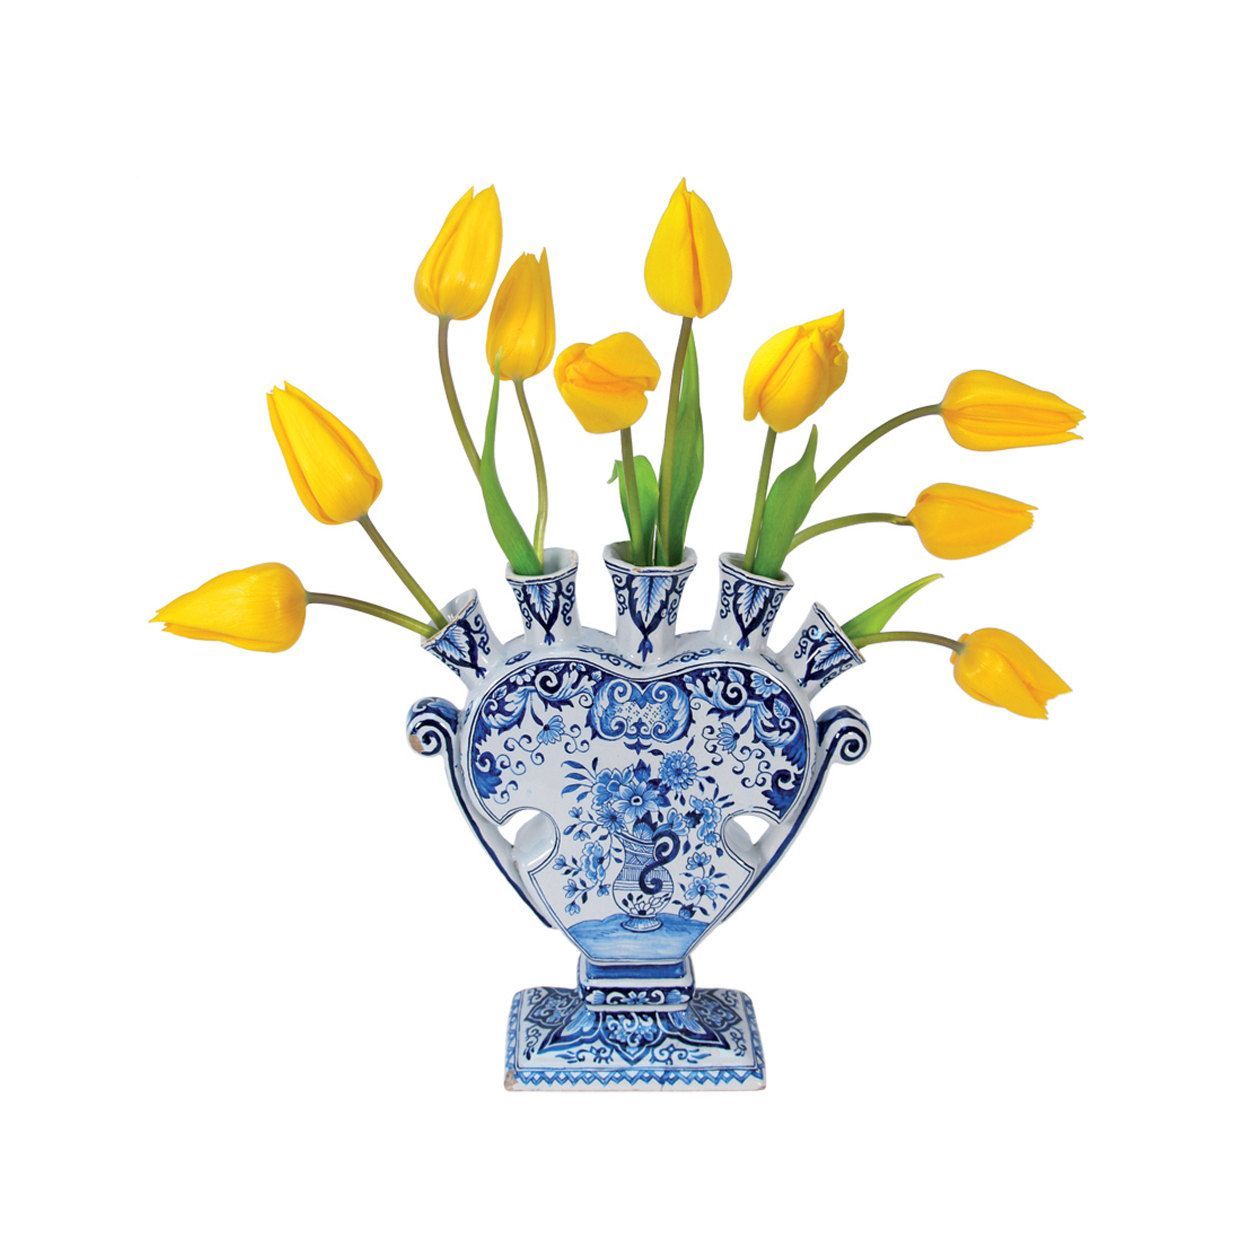 dutch, tulips, delft, delftware, tulipvase, home decor, decals